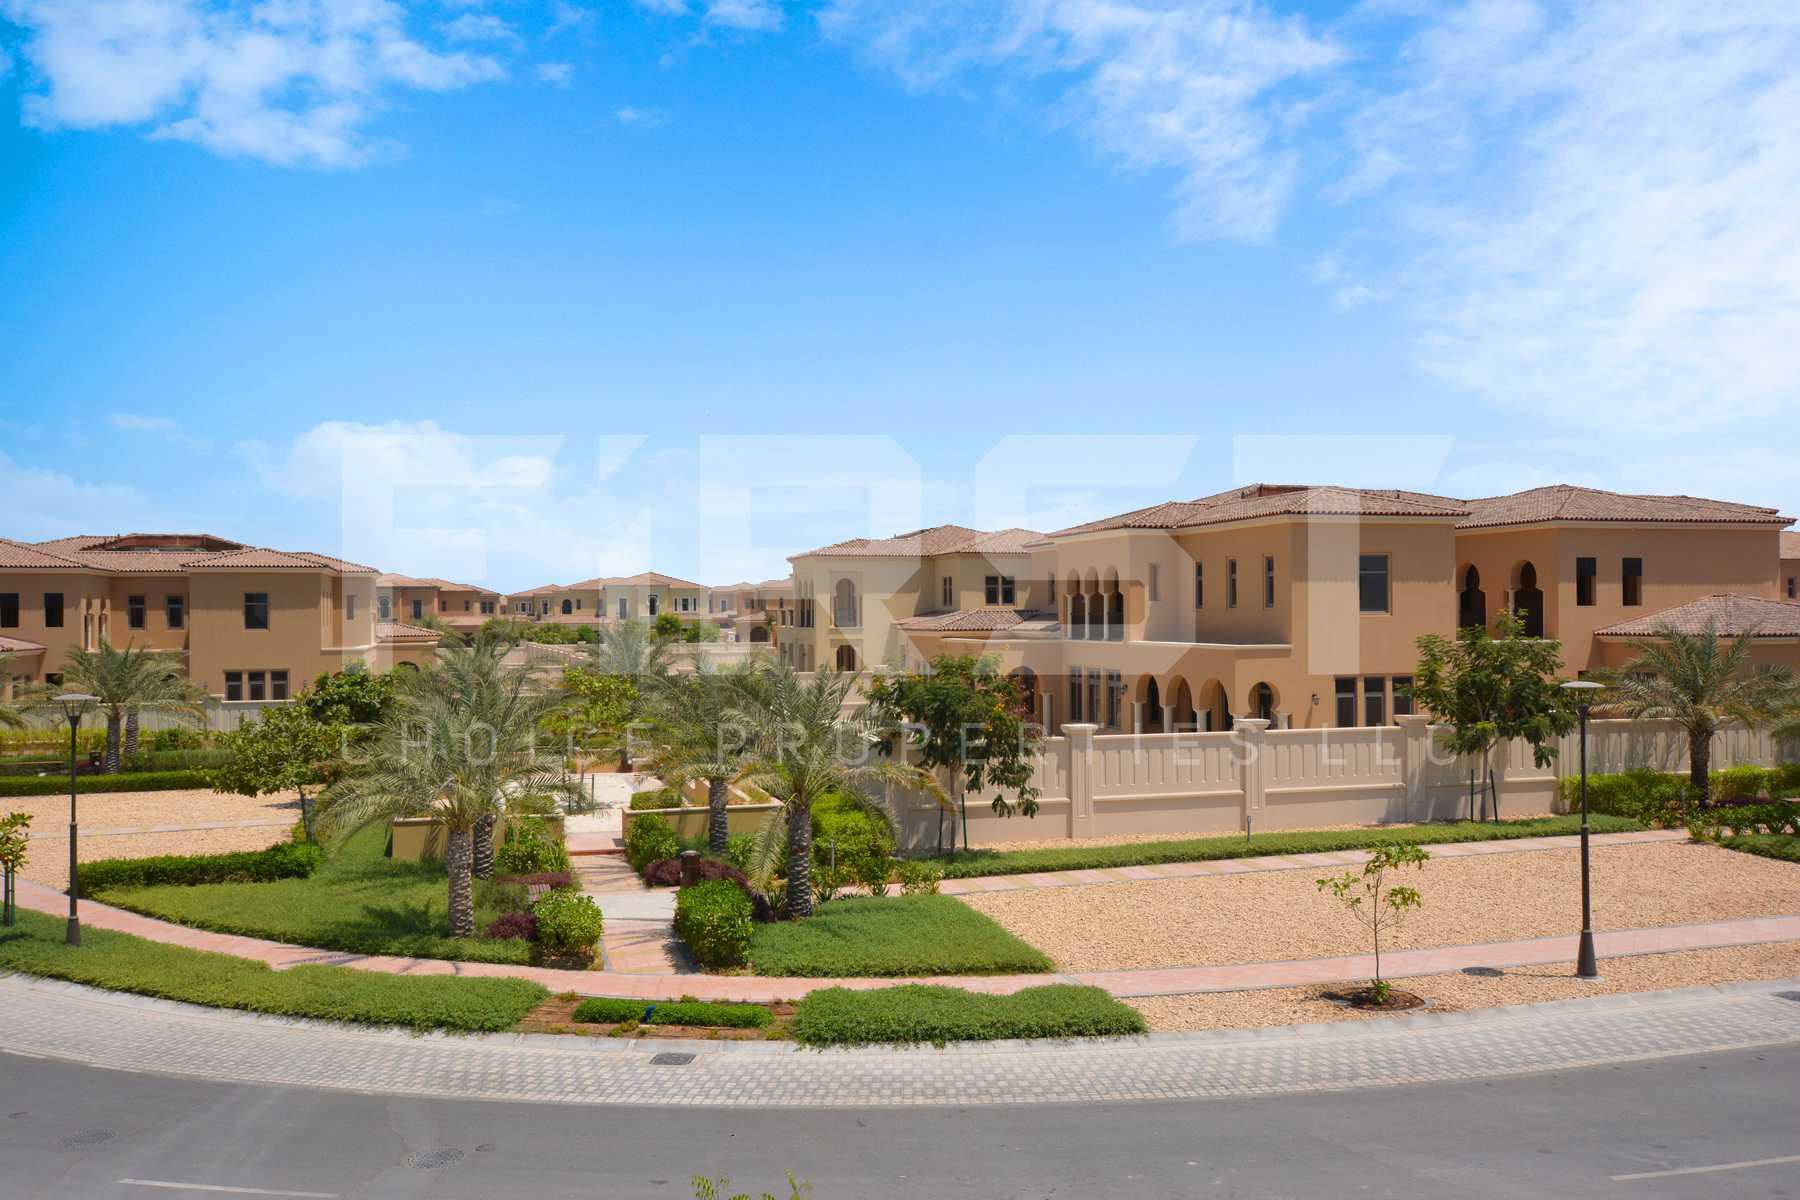 External Photo of Premium 5 Bedroom Villa in Saadiyat Beach Villas Saadiyat Island Abu Dhabi UAE (6).jpg